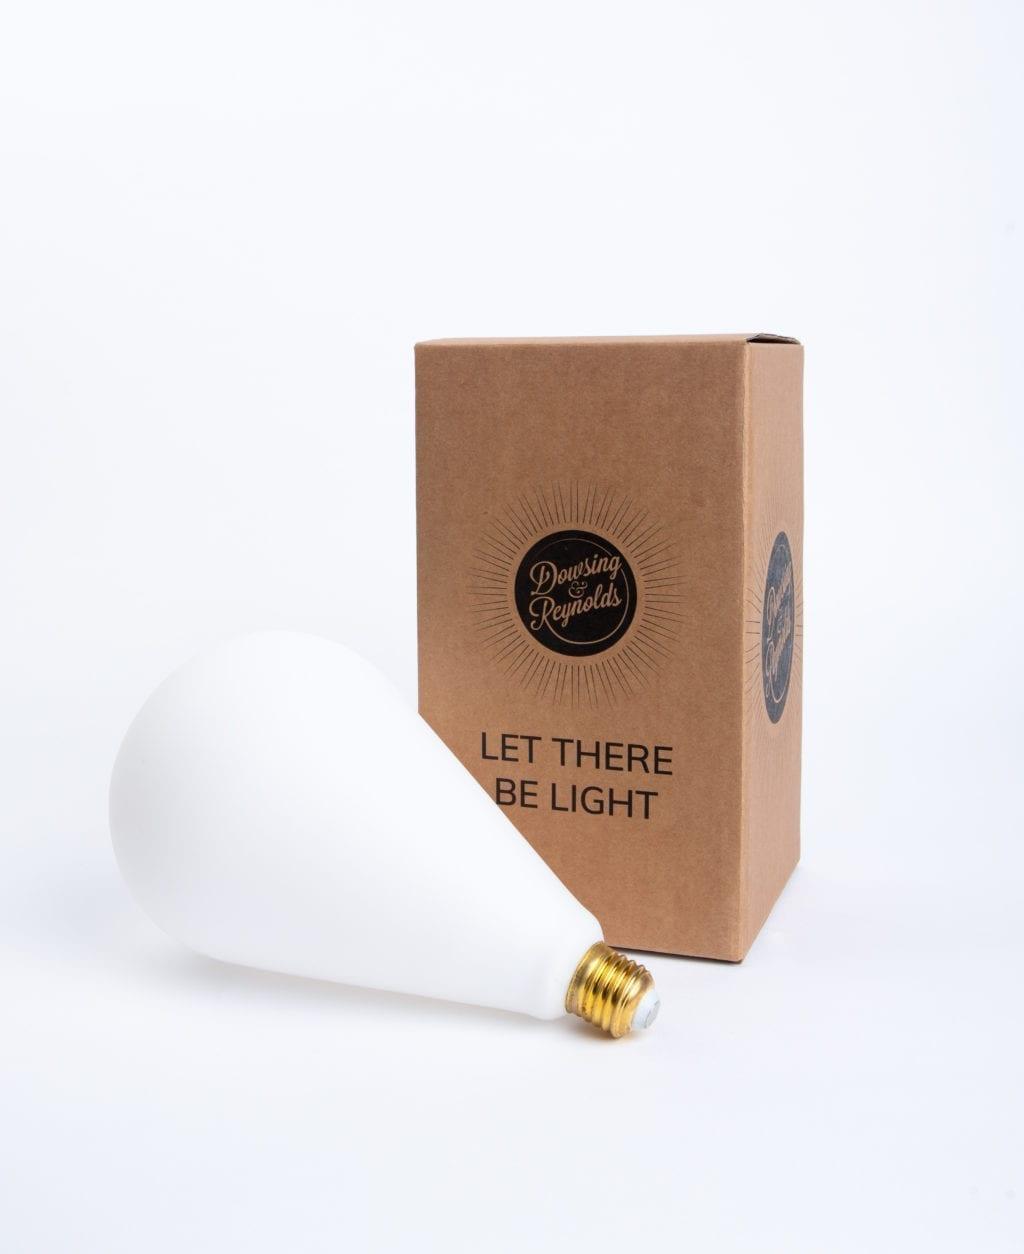 celestia opal bulb with cardboard box on white background